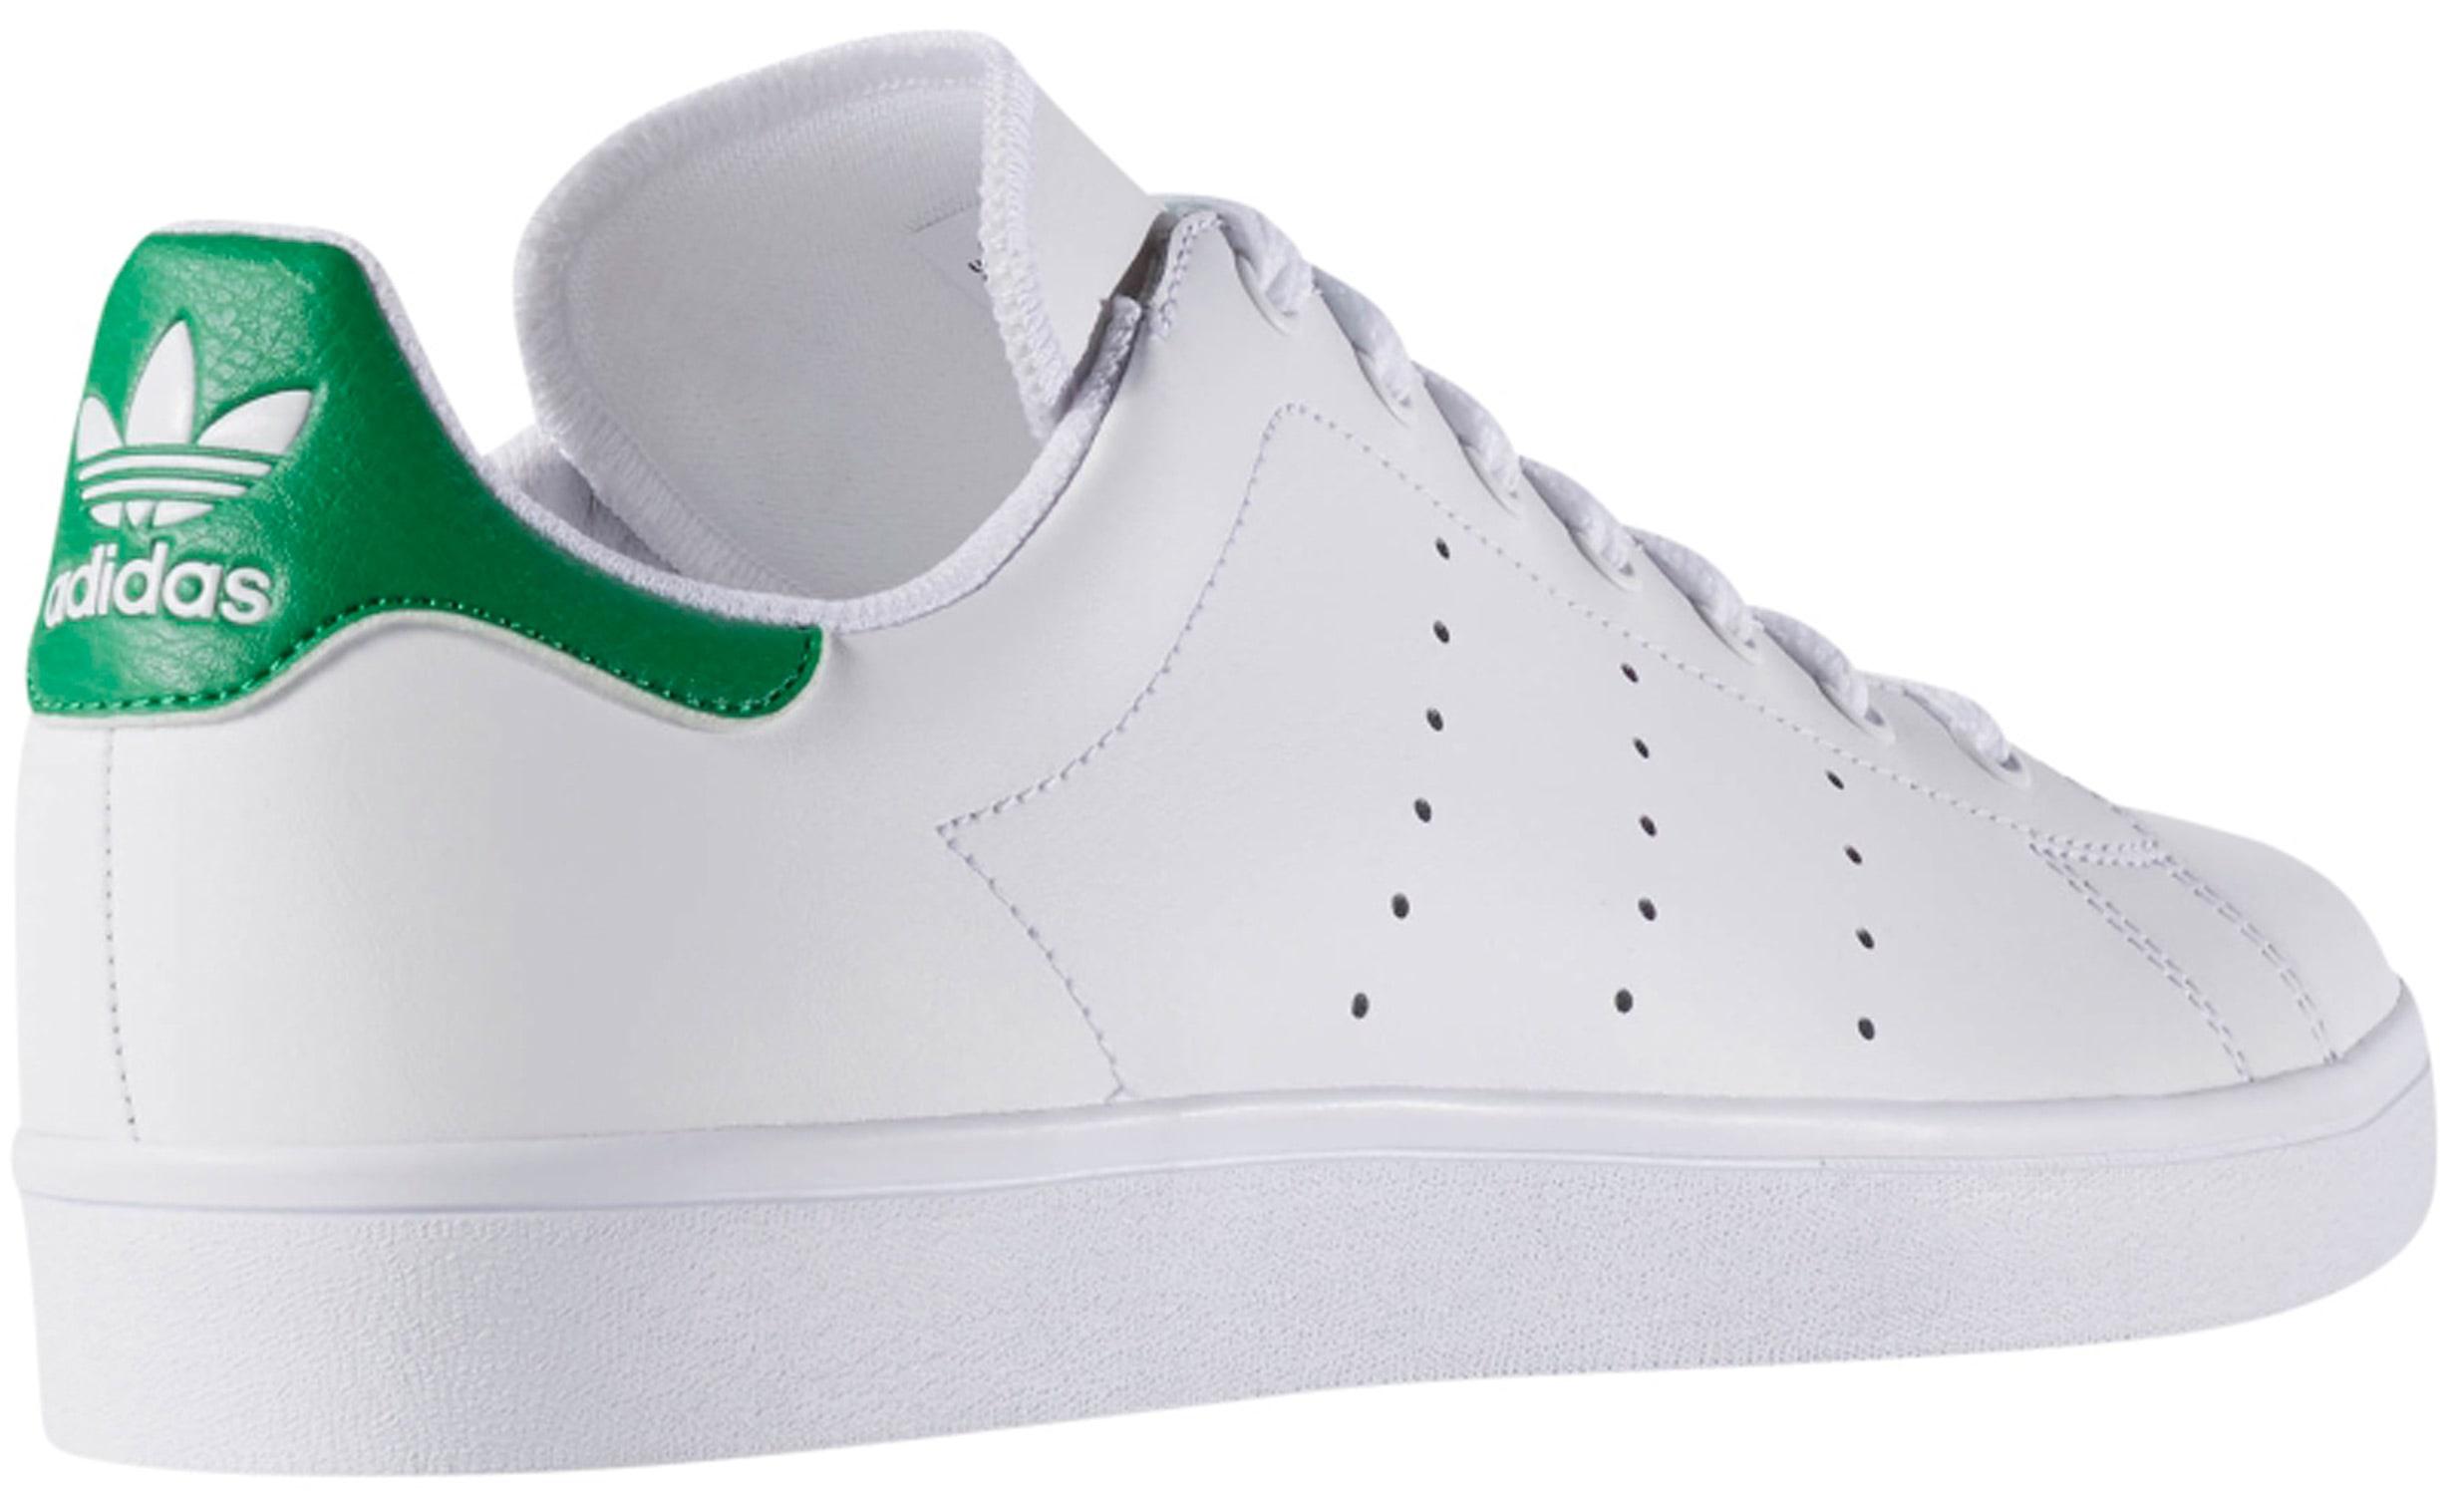 843ba6254b8 Adidas Stan Smith Vulc Skate Shoes - thumbnail 3